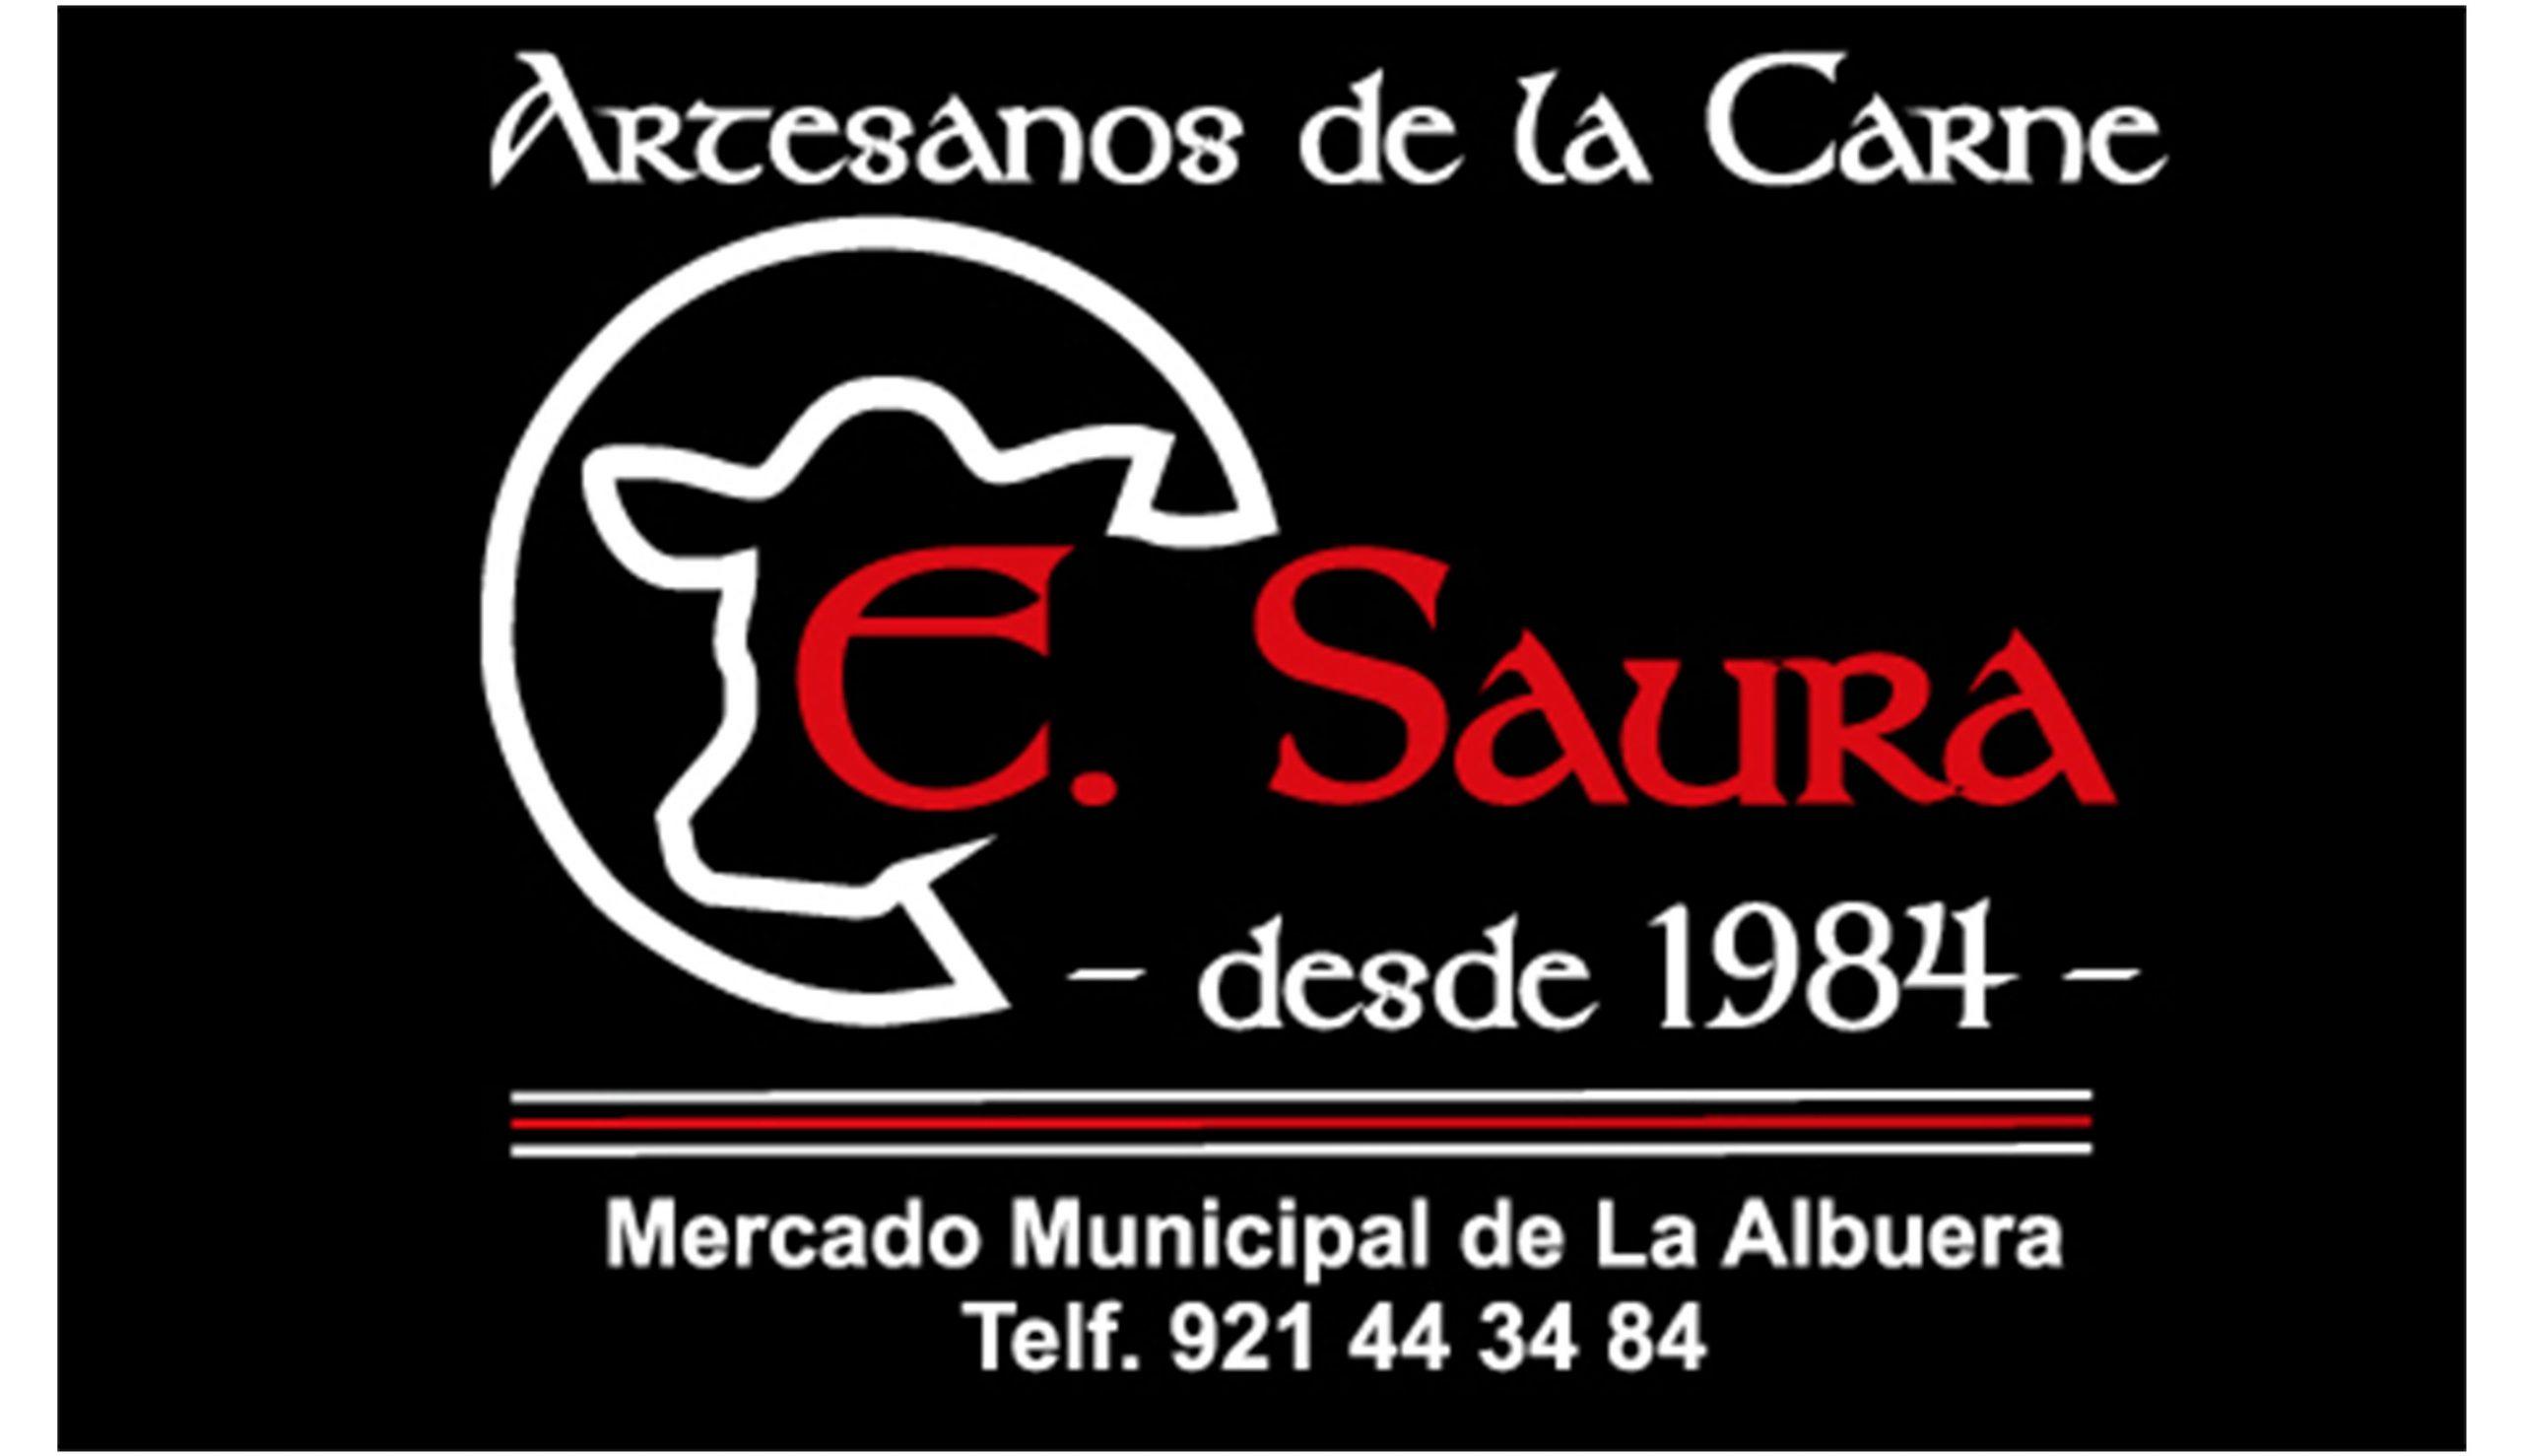 ArtesanosCarne_E_Saura